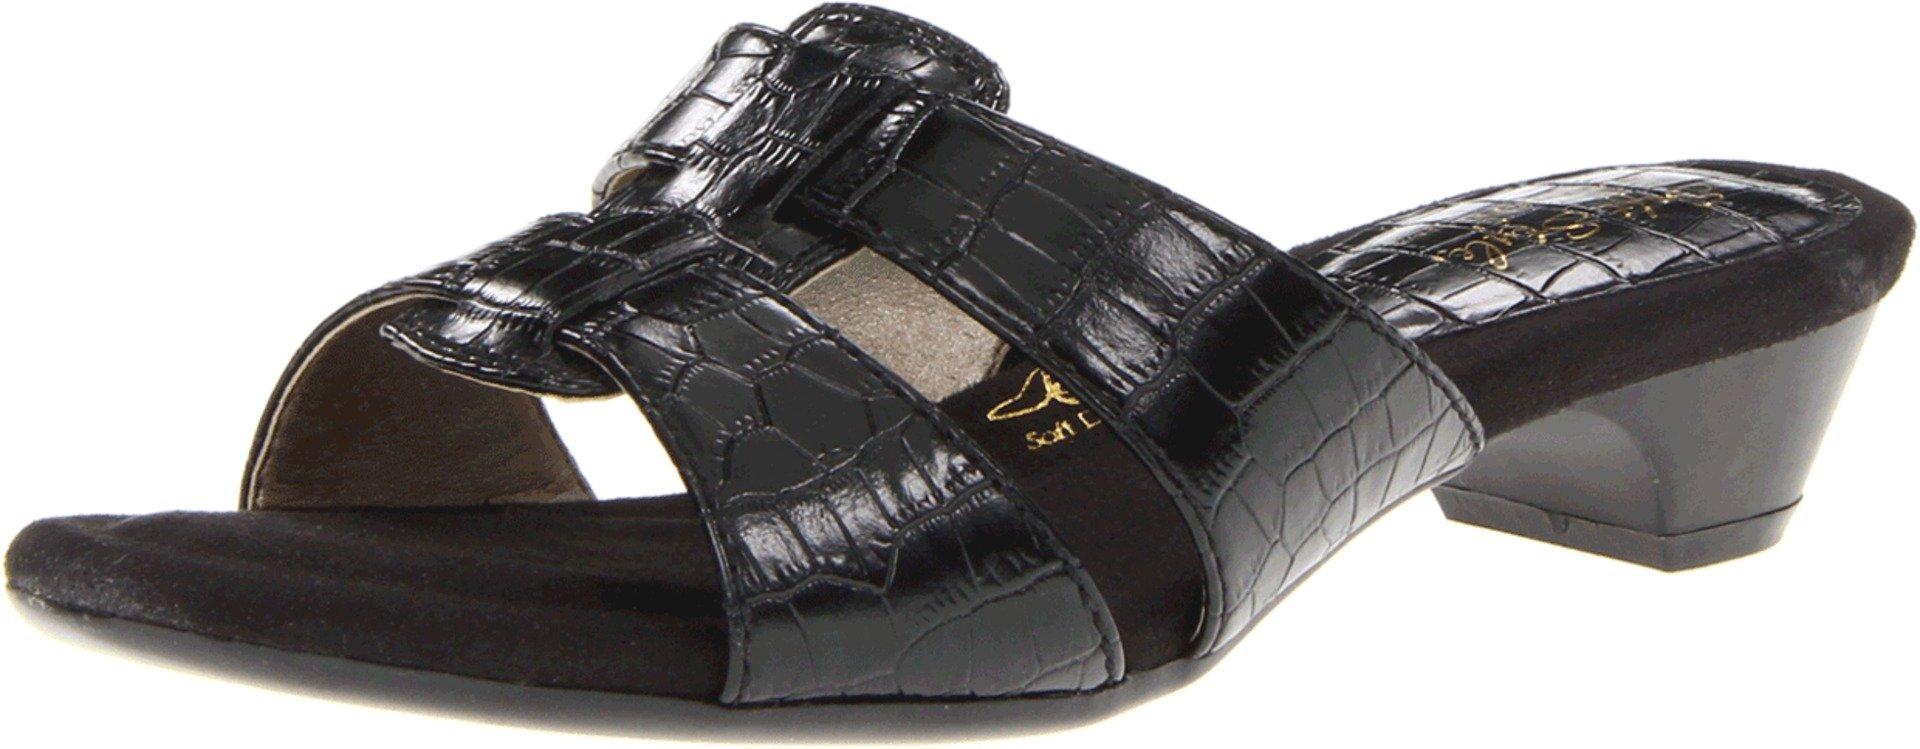 Soft Style Women's Ellary Snadal,Black,10 M US